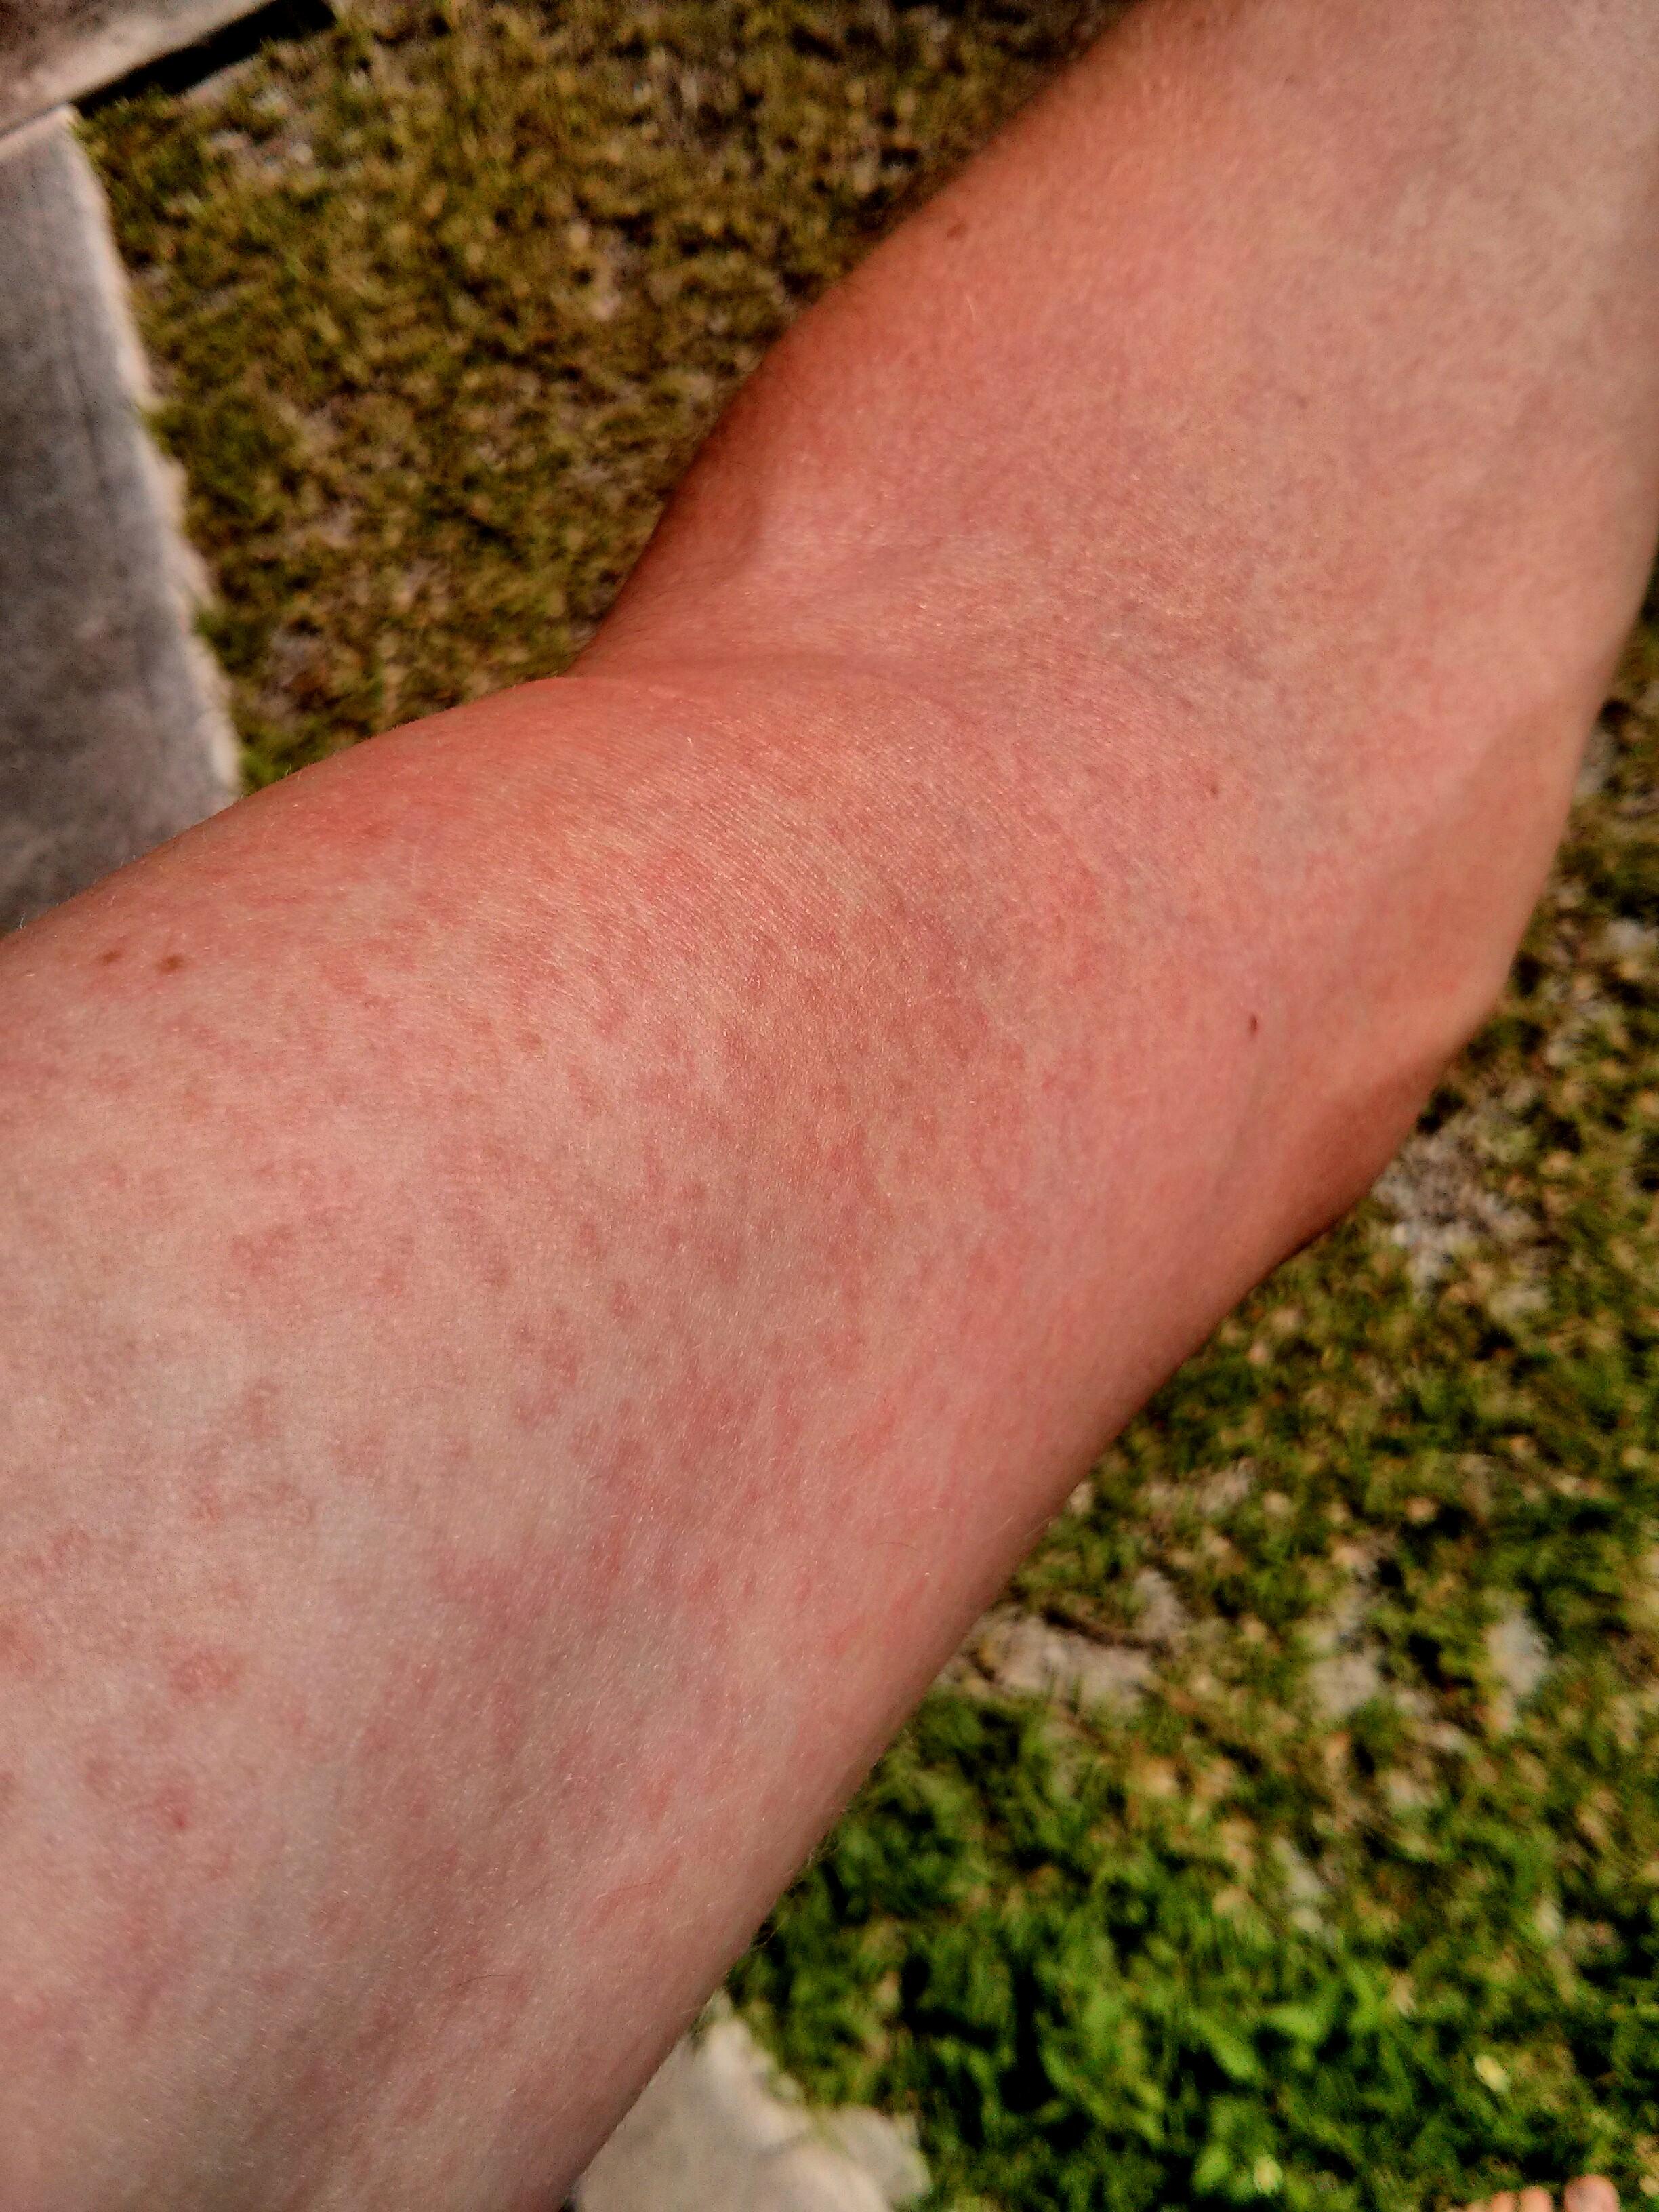 Vyrážka na paži po infekci virem zika. (Kredit: Wikipedie CC BY-SA 3.0)